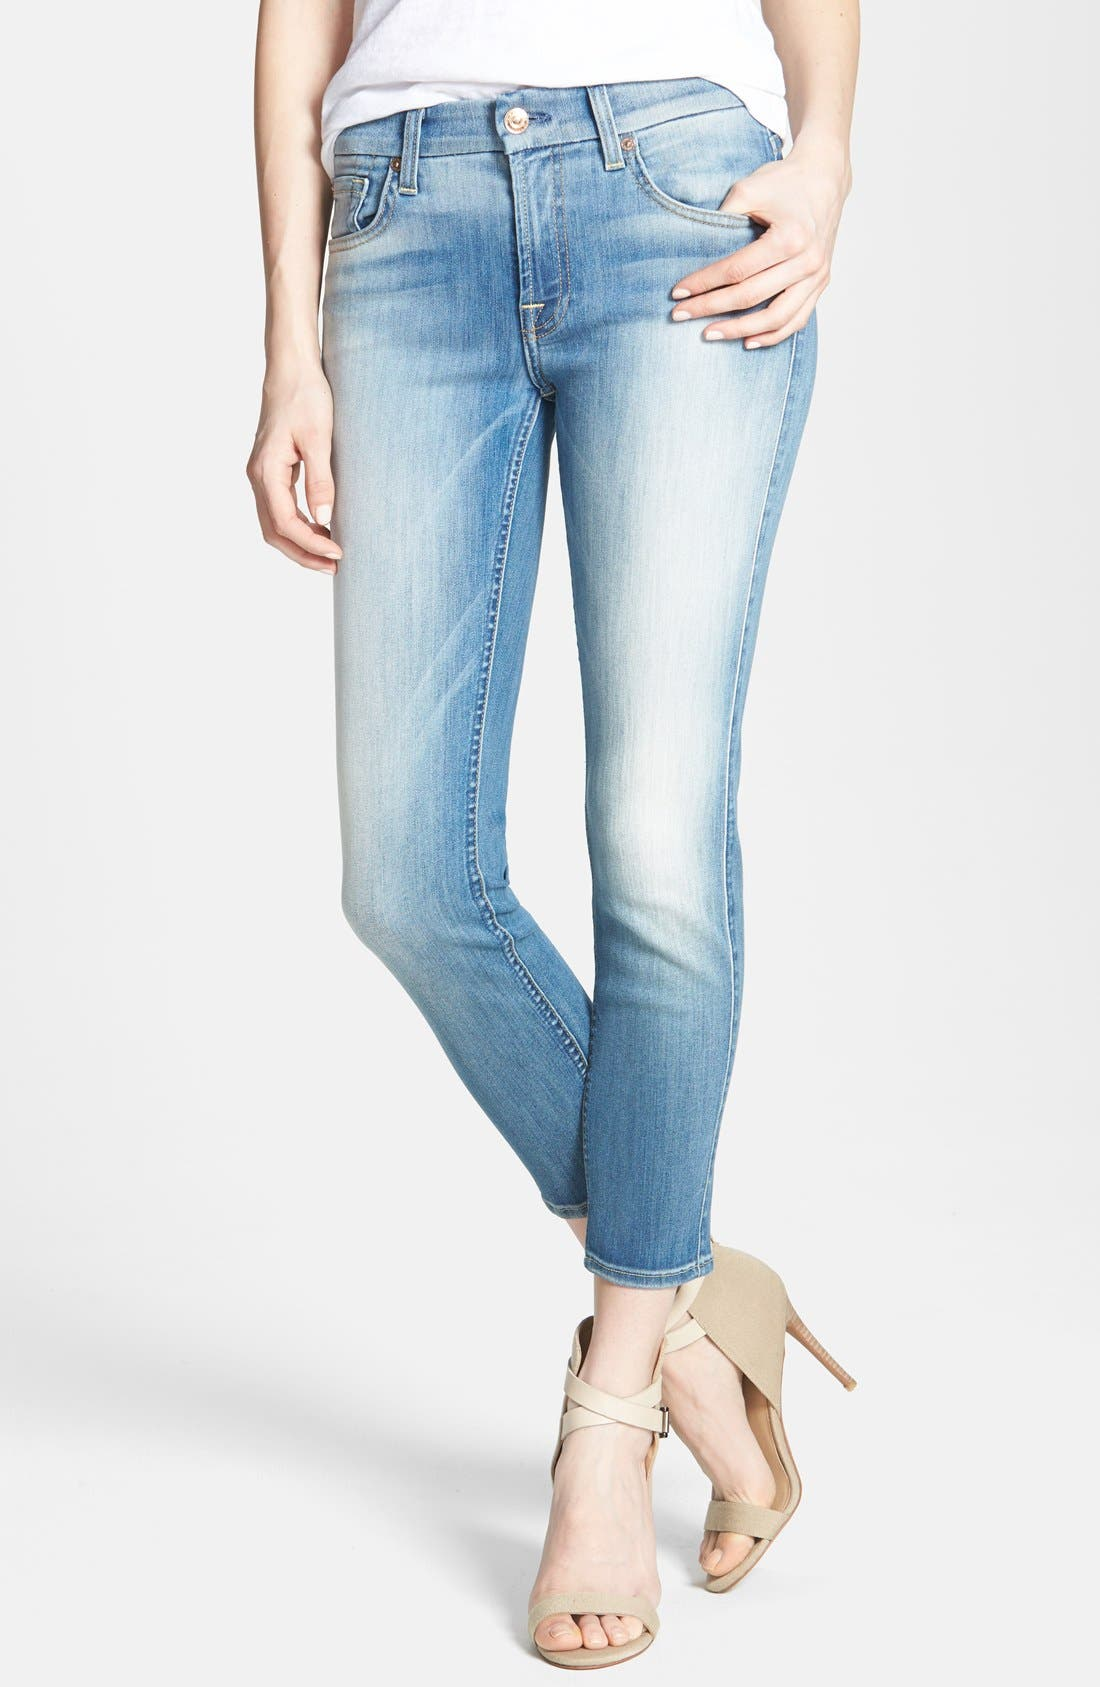 Alternate Image 1 Selected - 7 For All Mankind® 'Kimmie' Crop Skinny Jeans (Light Cobalt Blue)